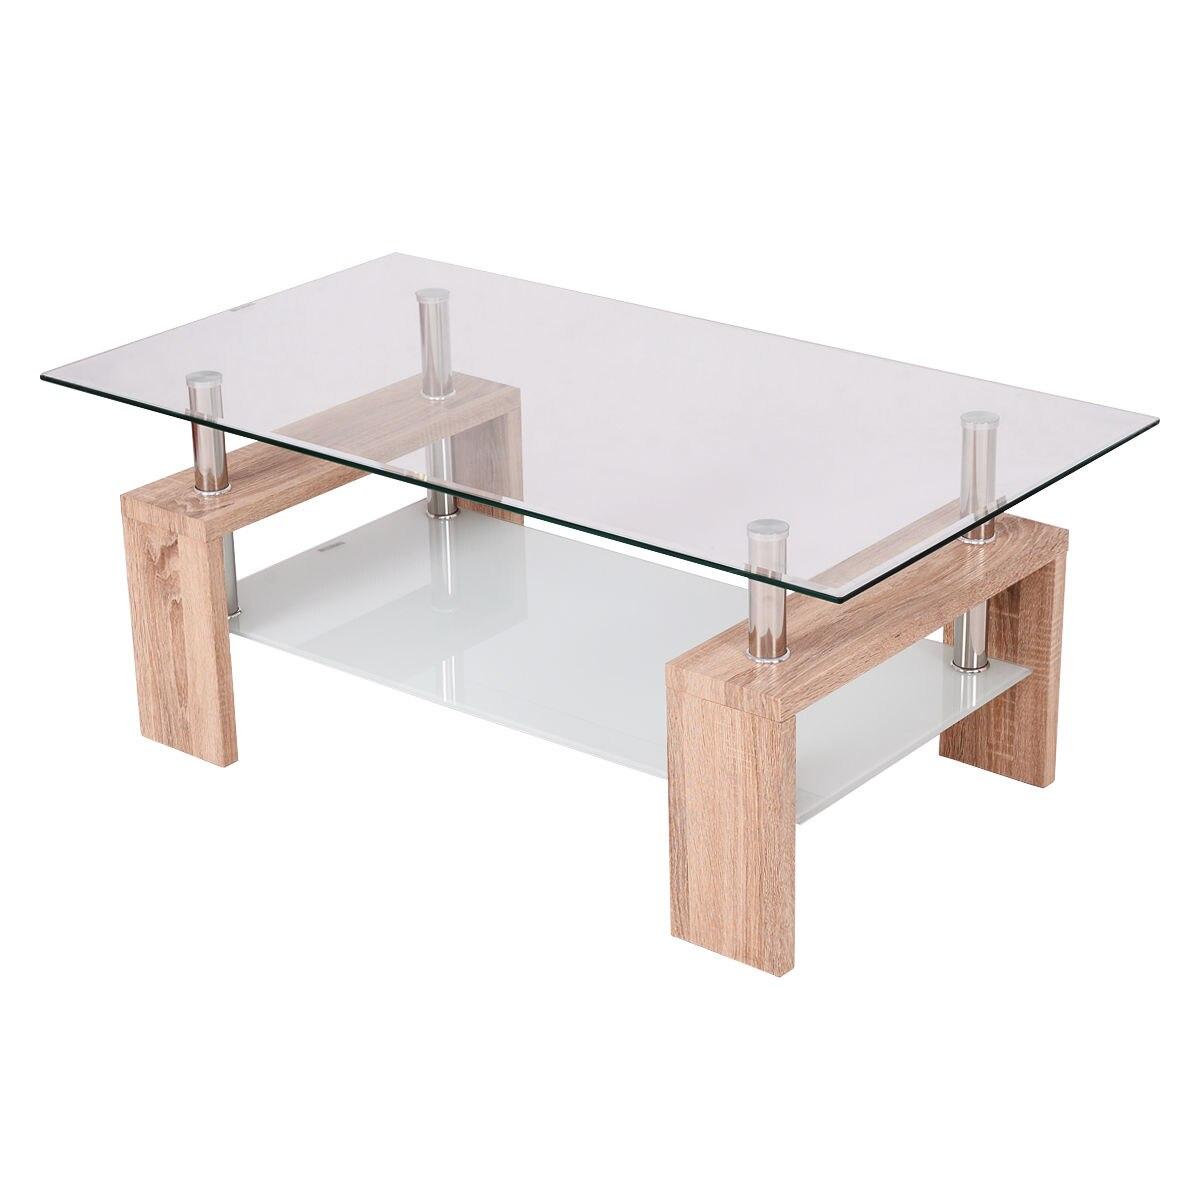 Giantex Rectangular Tempered Glass Coffee Table With Shelf Modern - Rectangular glass side table